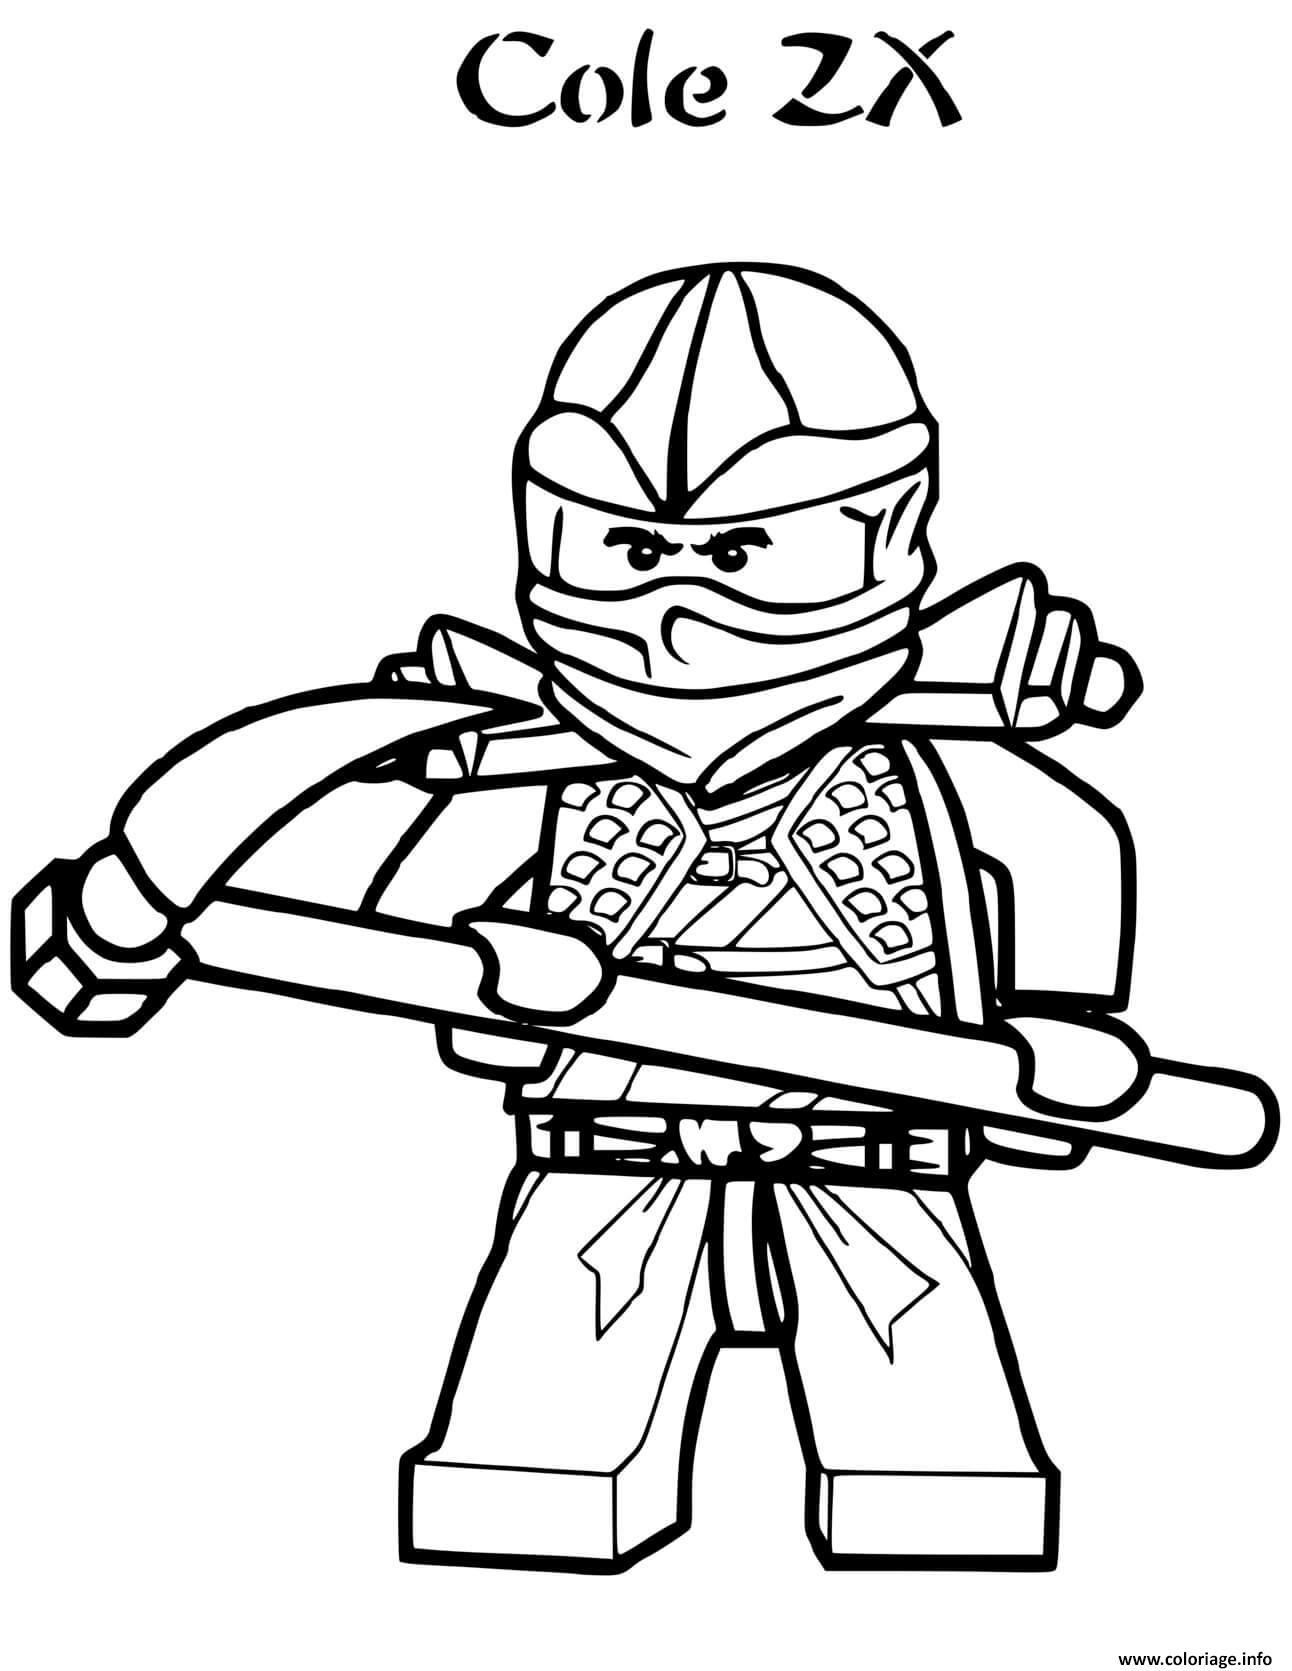 Dessin ninjago cole zx ninja Coloriage Gratuit à Imprimer